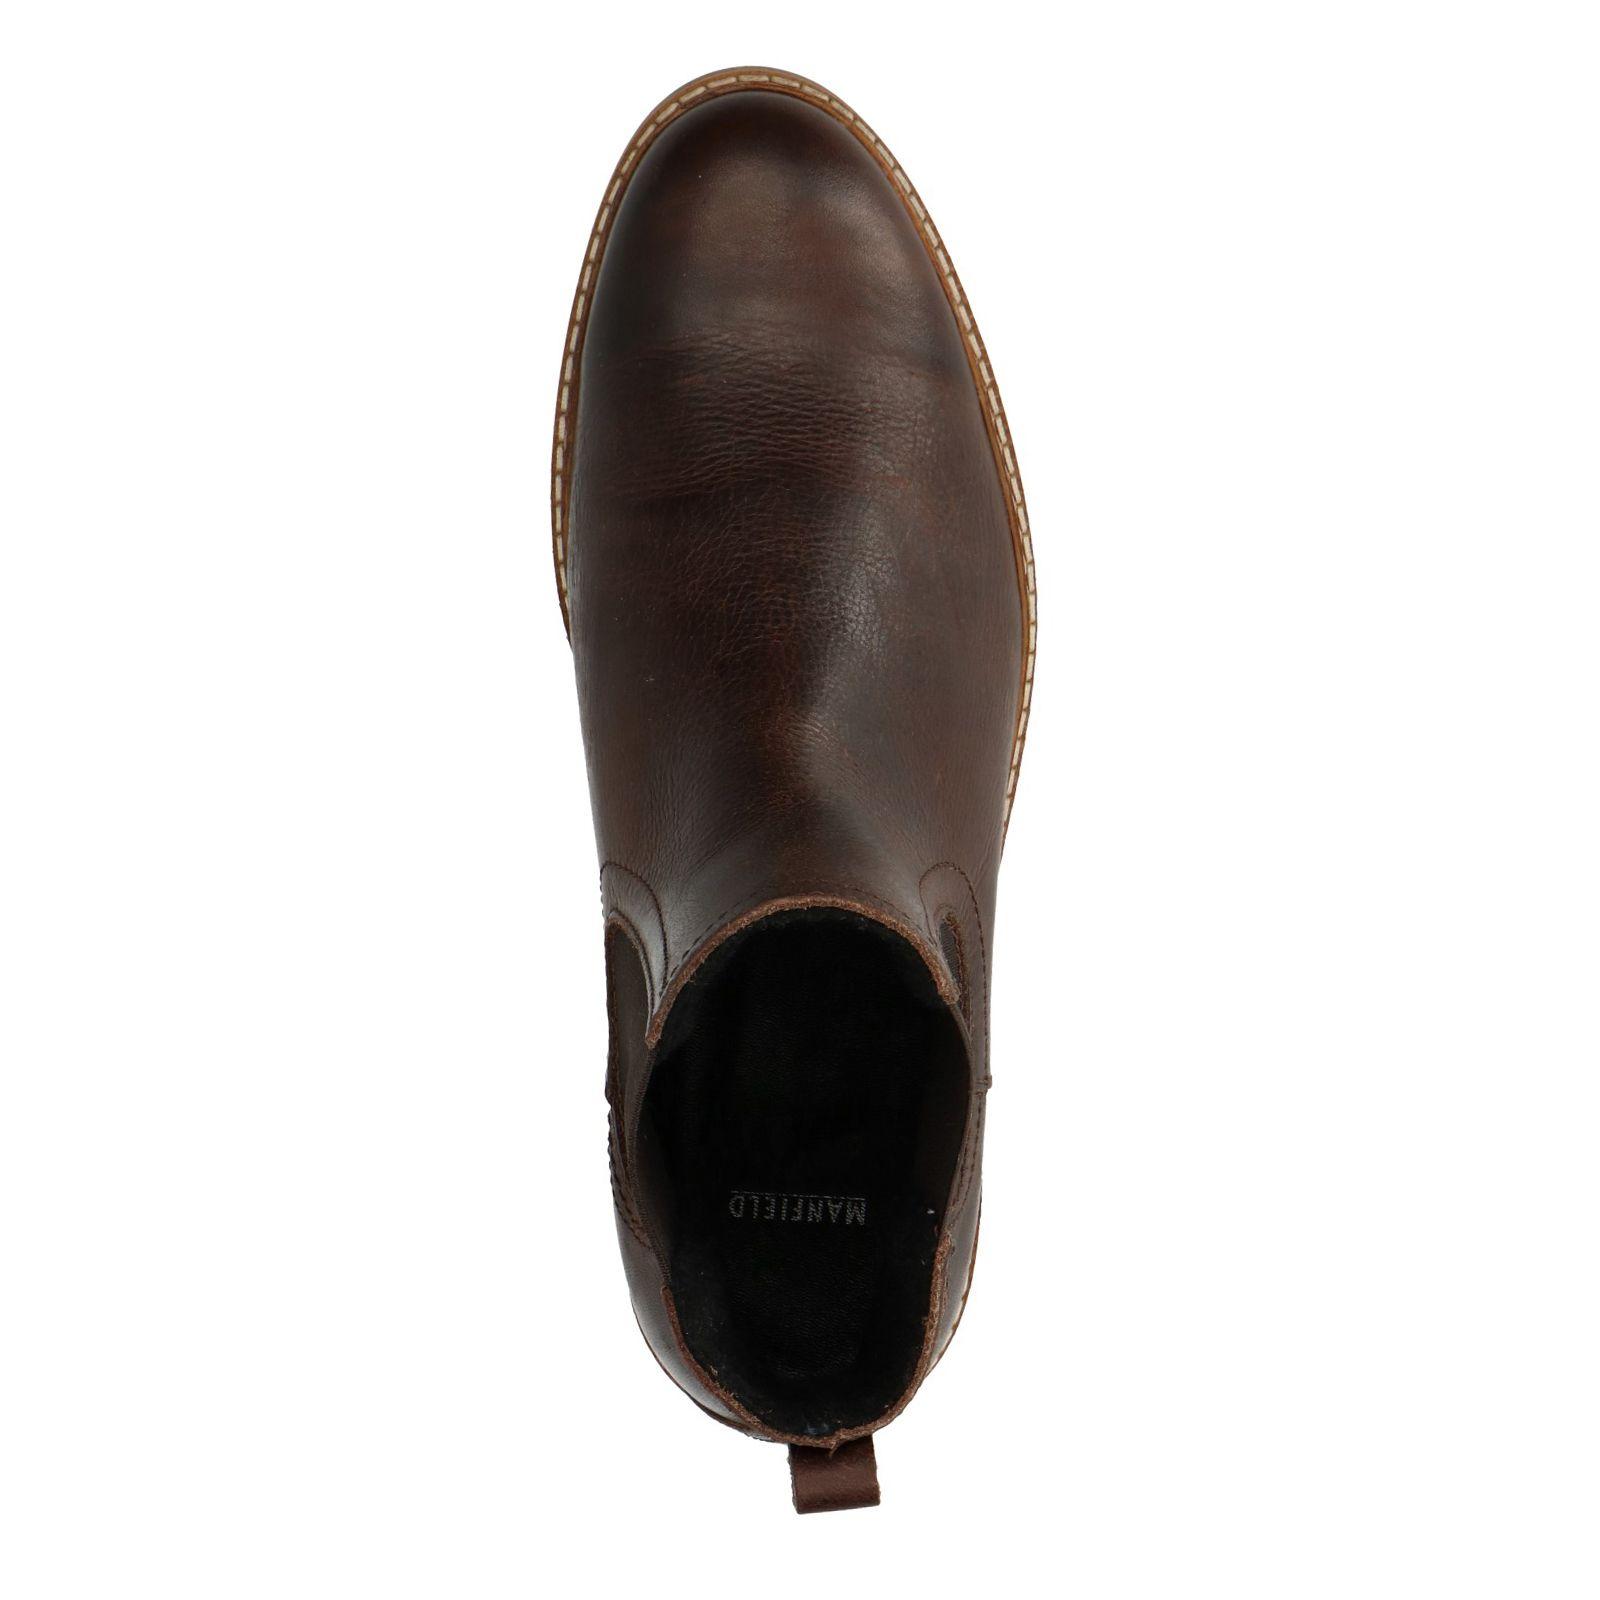 bfbcb5745277b4 Manfield Dunkelbraune Chelsea Boots. - 20%. prev